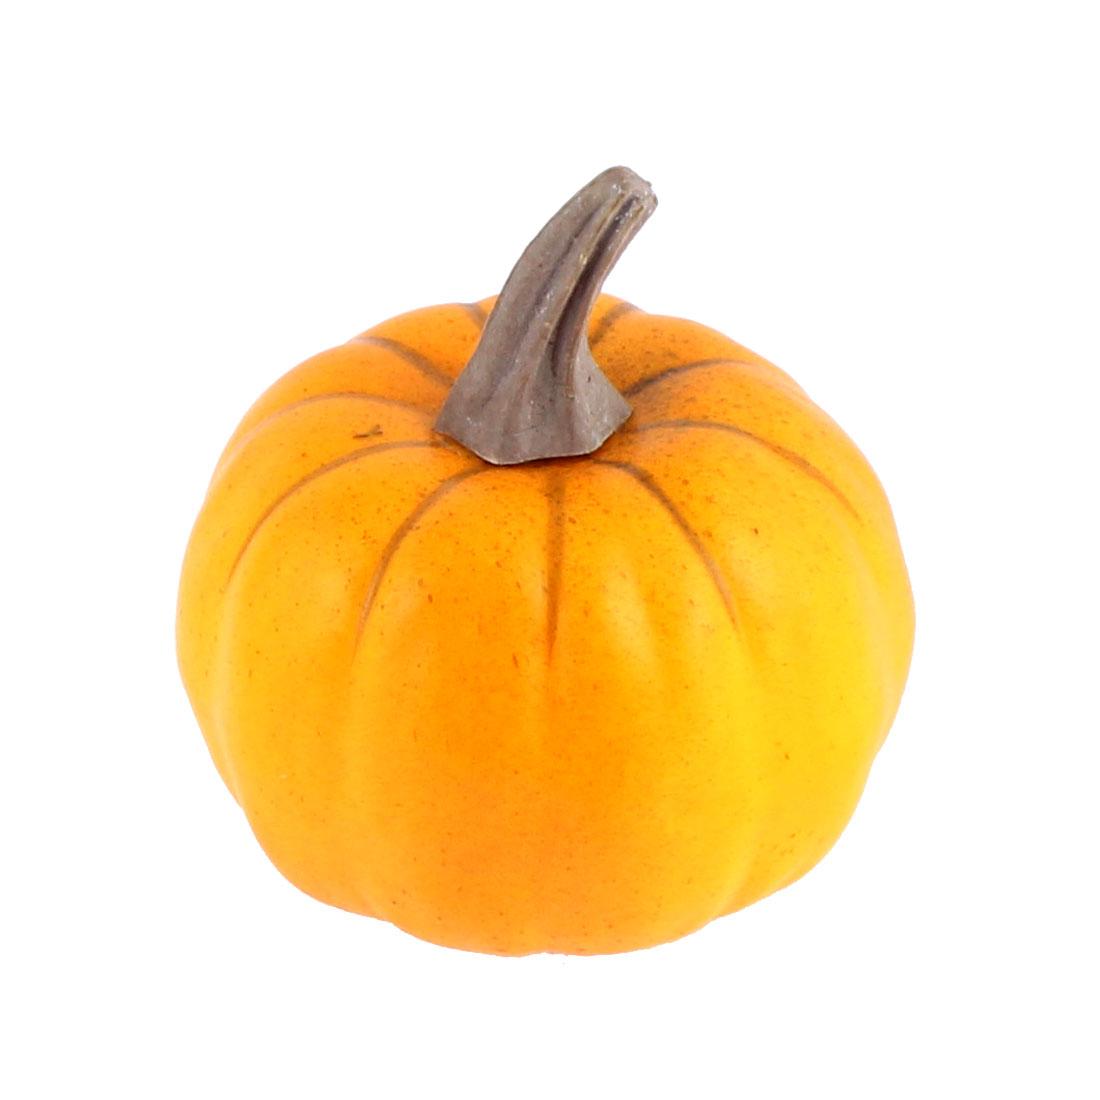 Home Kitchen Party Artificial Vegetable Decor Teaching Props Mini Pumpkin Orange